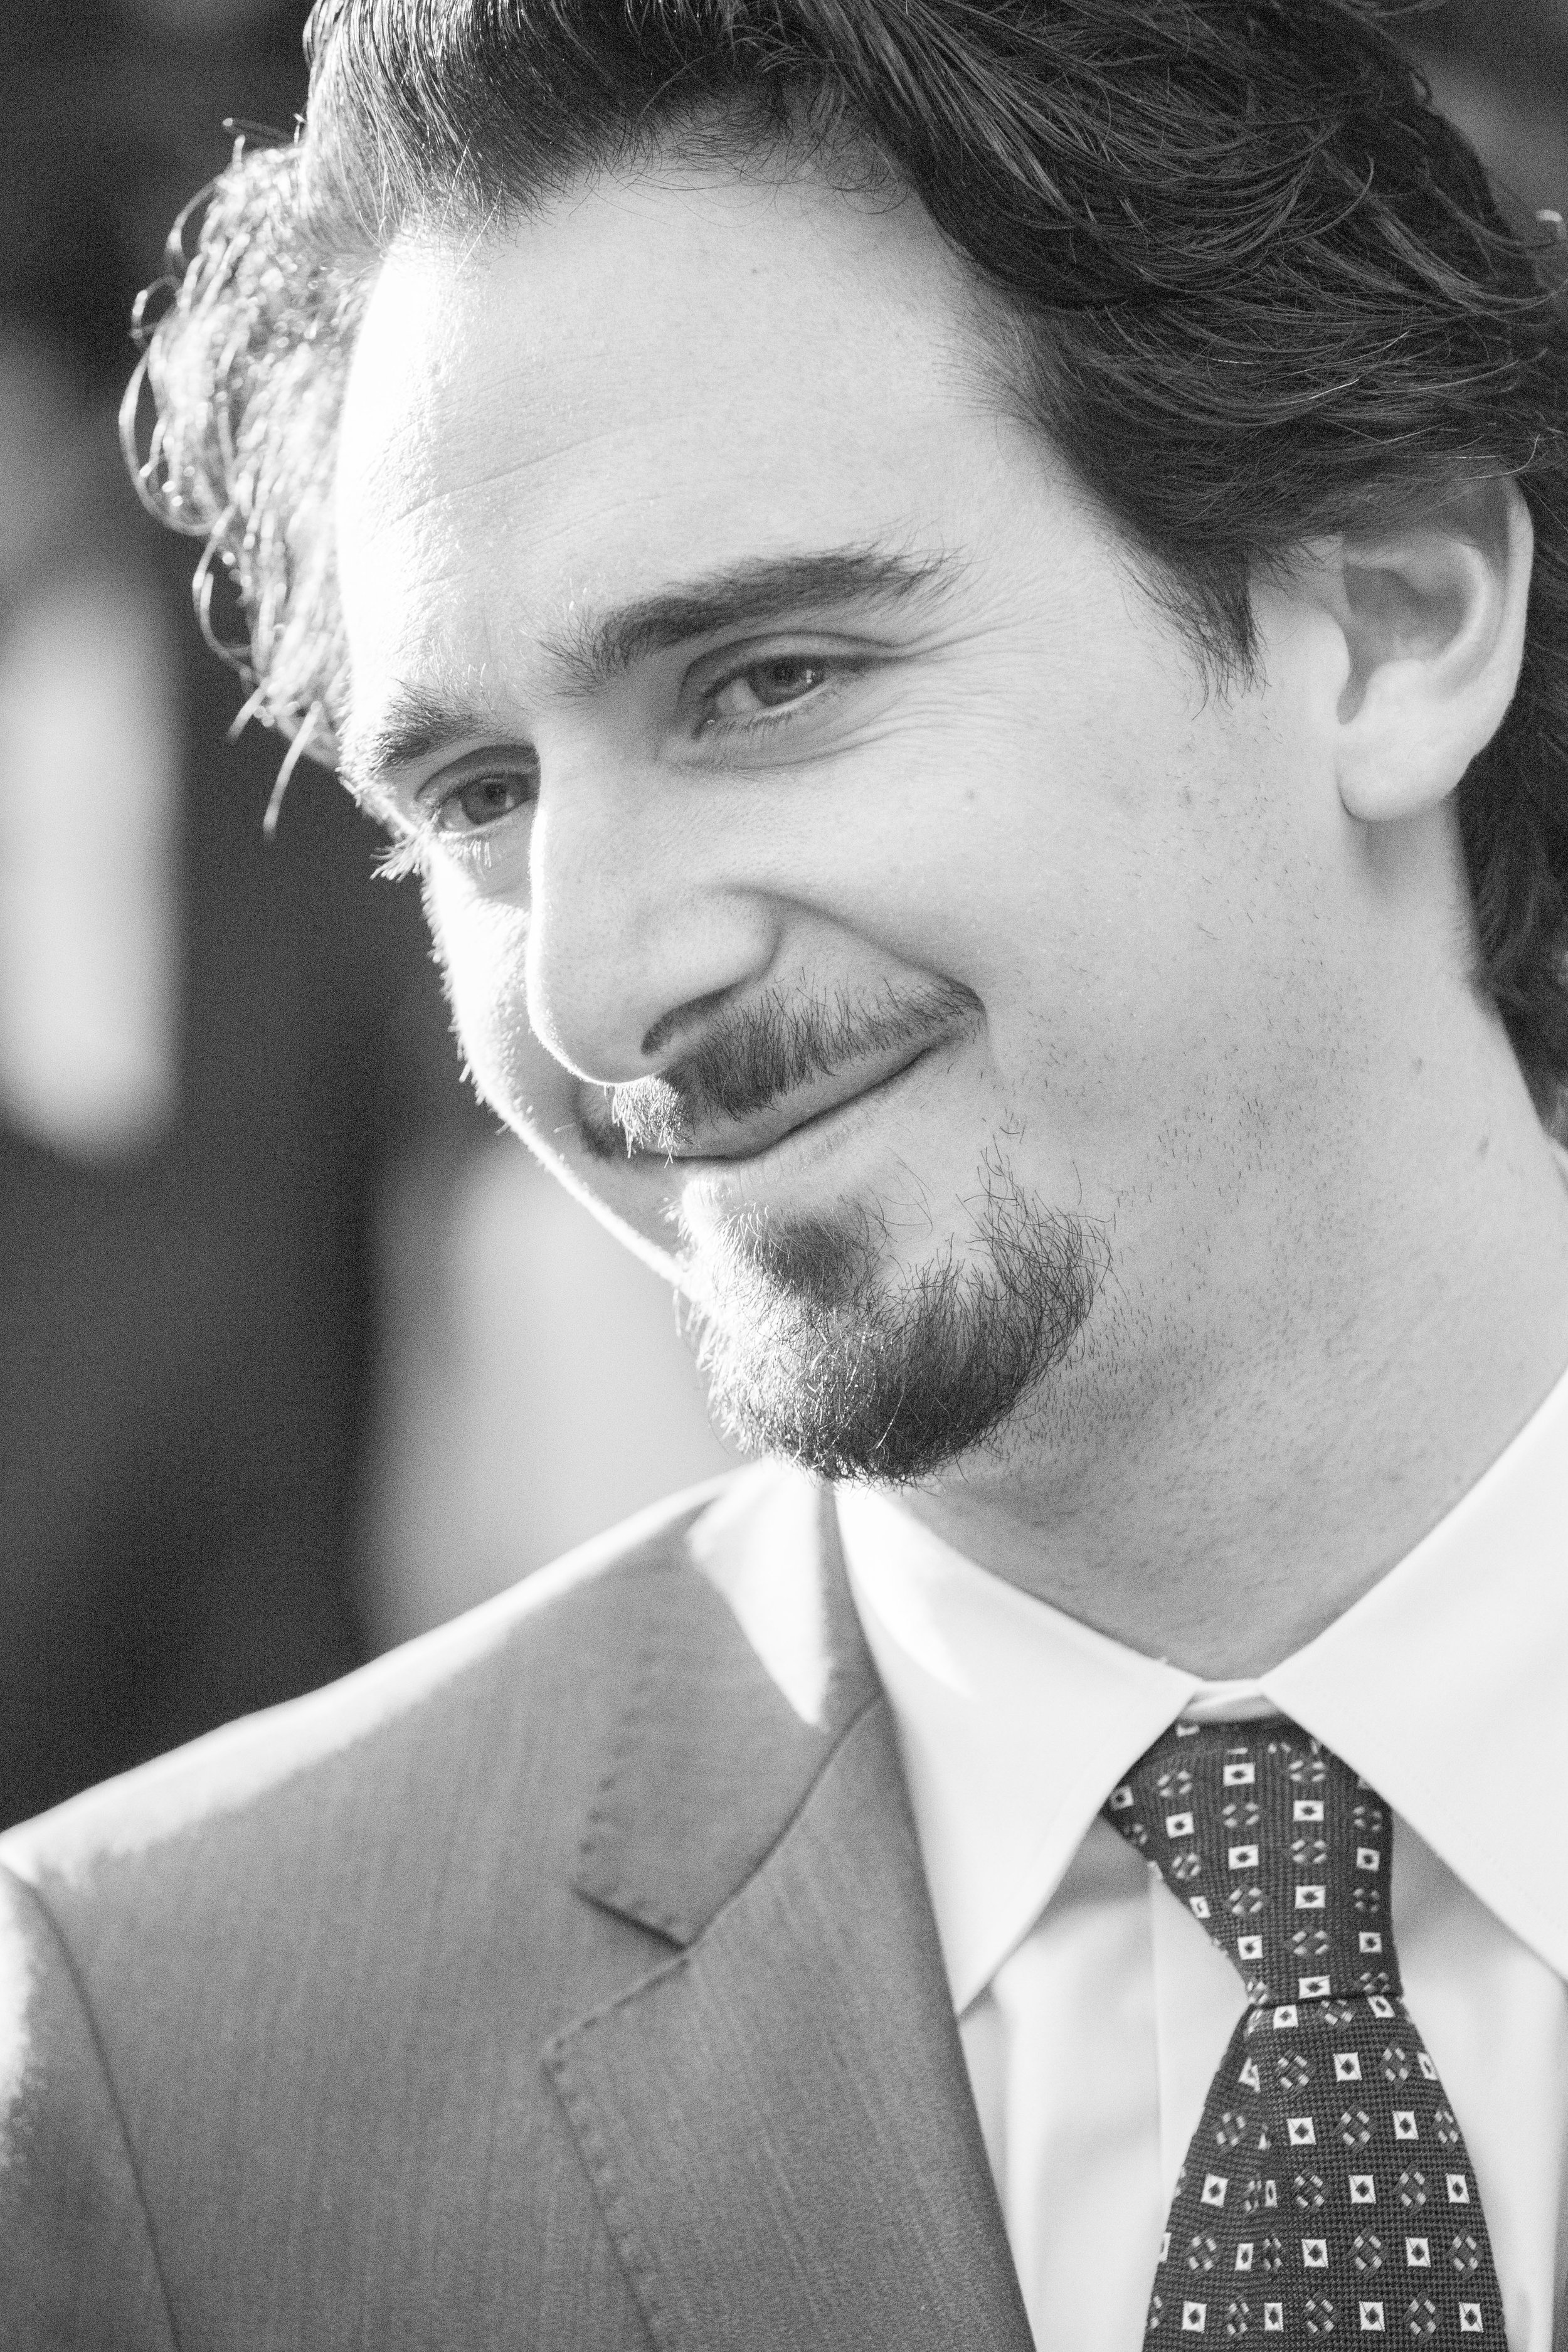 Lic. Paolo Onofrietti - Paolo  CEO